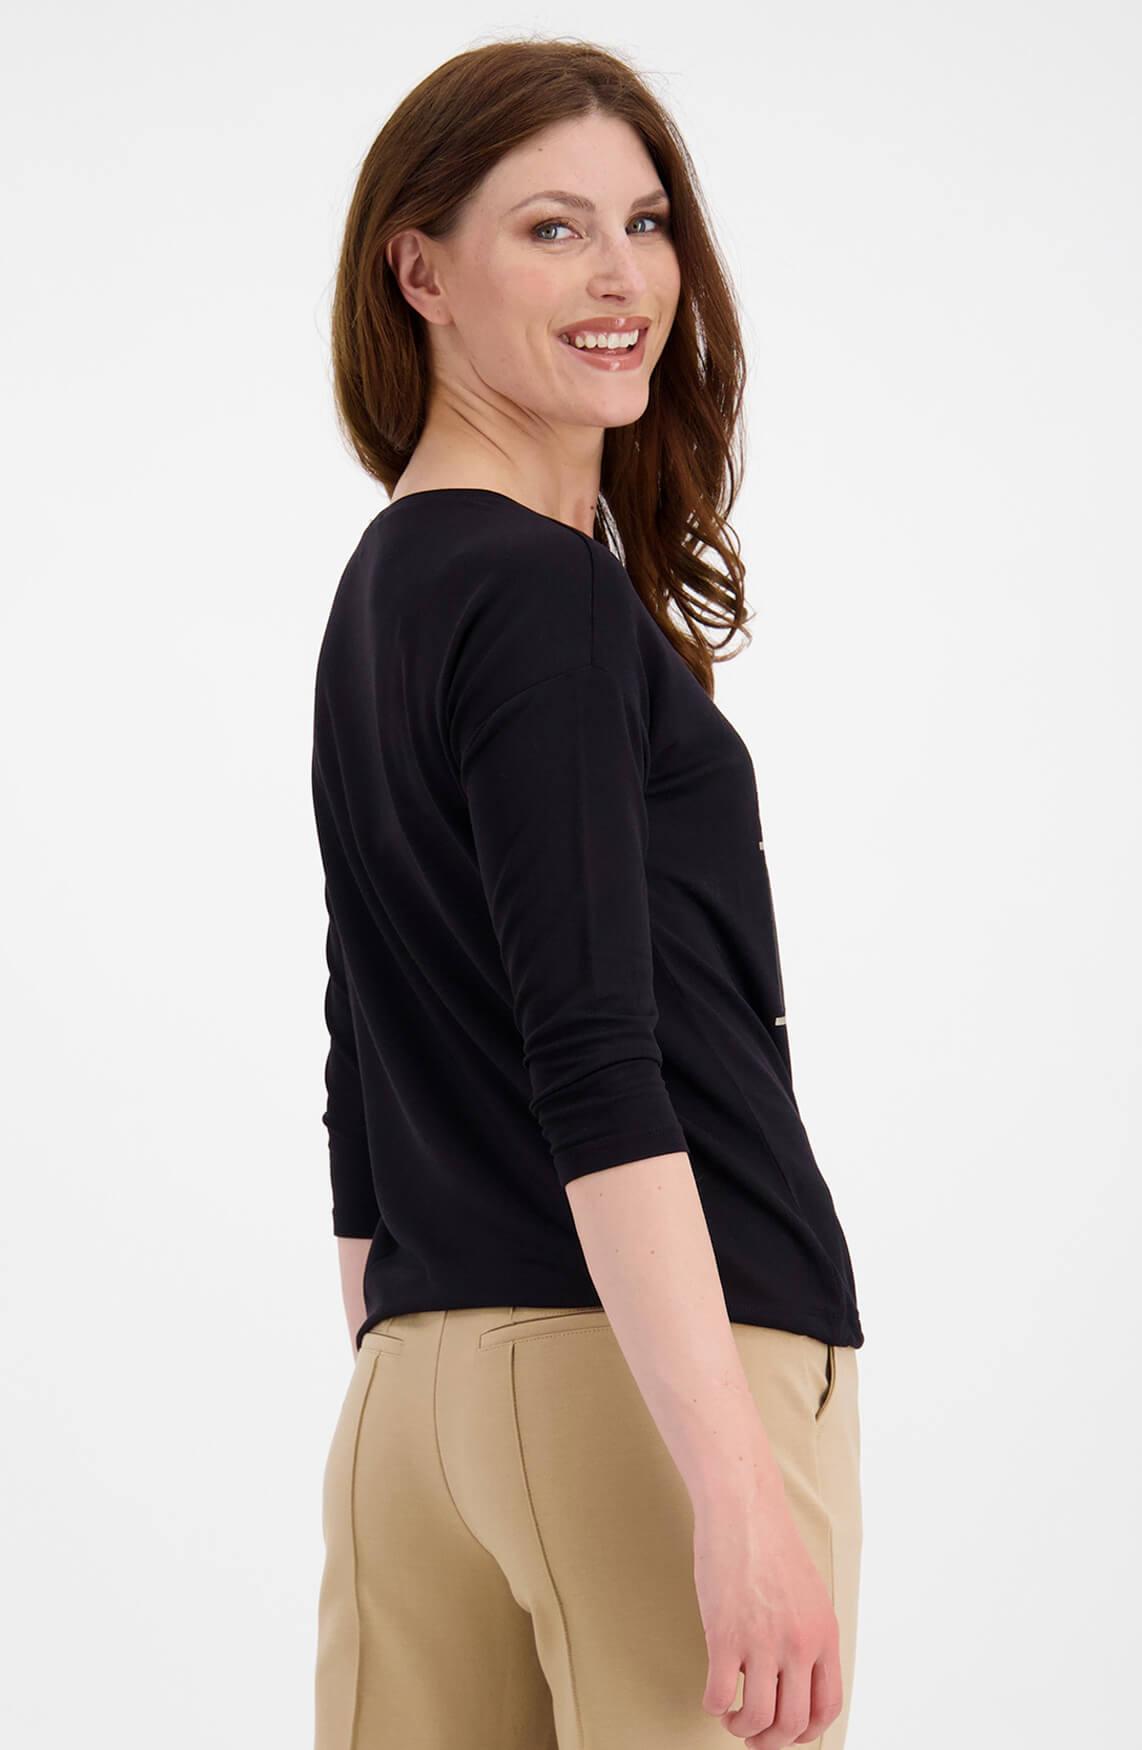 Monari Dames Shirt met 3D opdruk zwart